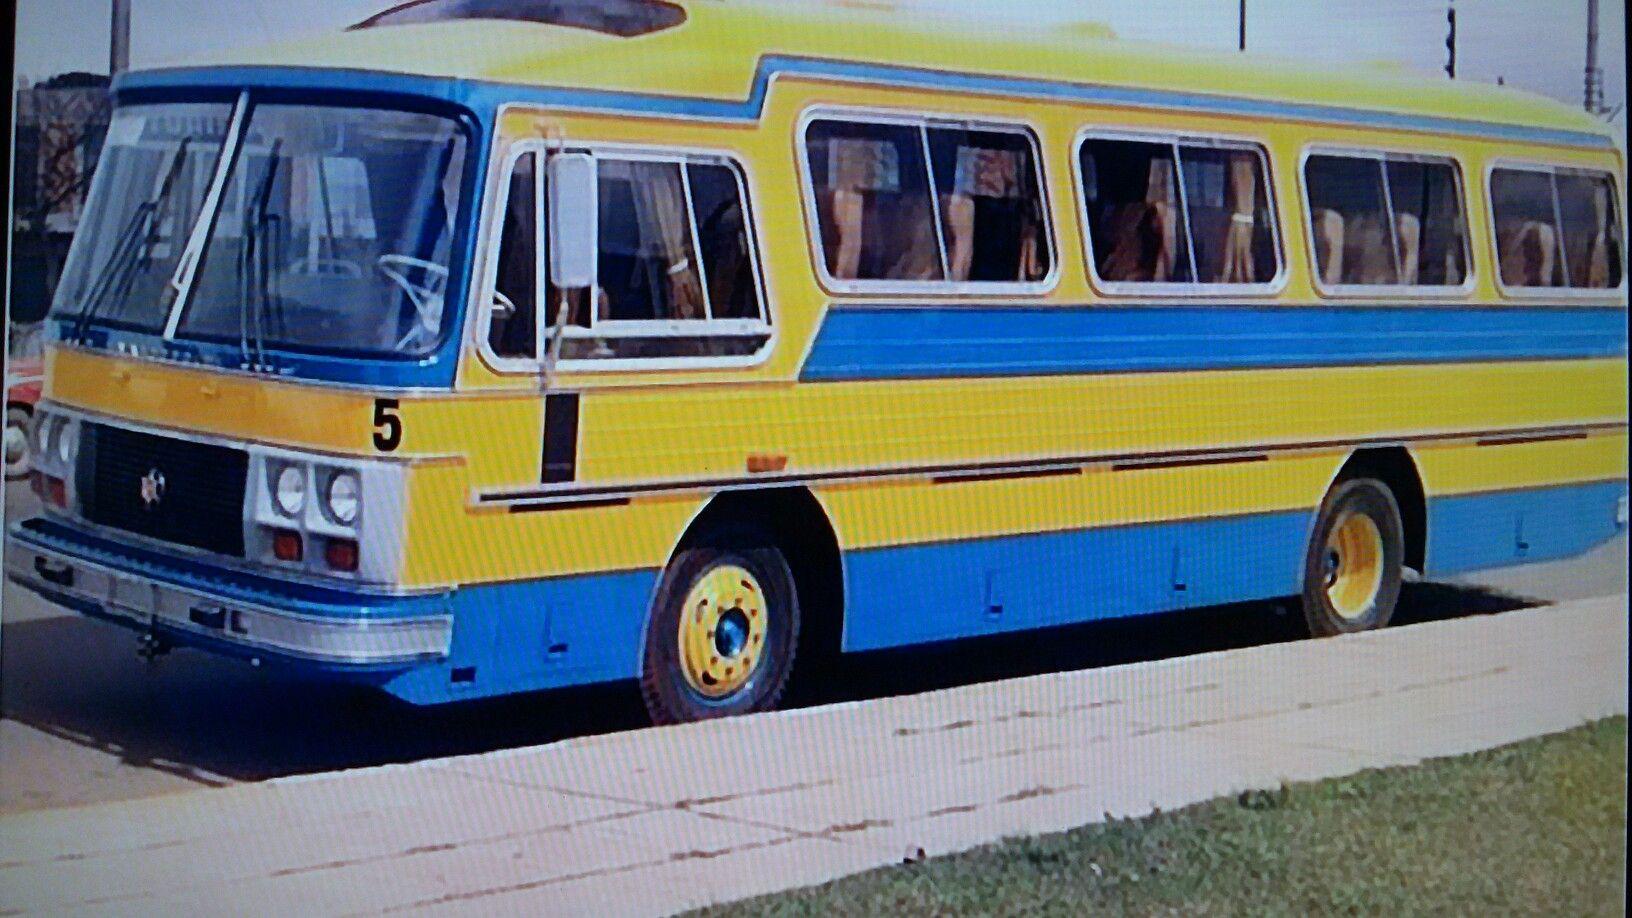 Ónibus Intermunicipal /Marcopolo